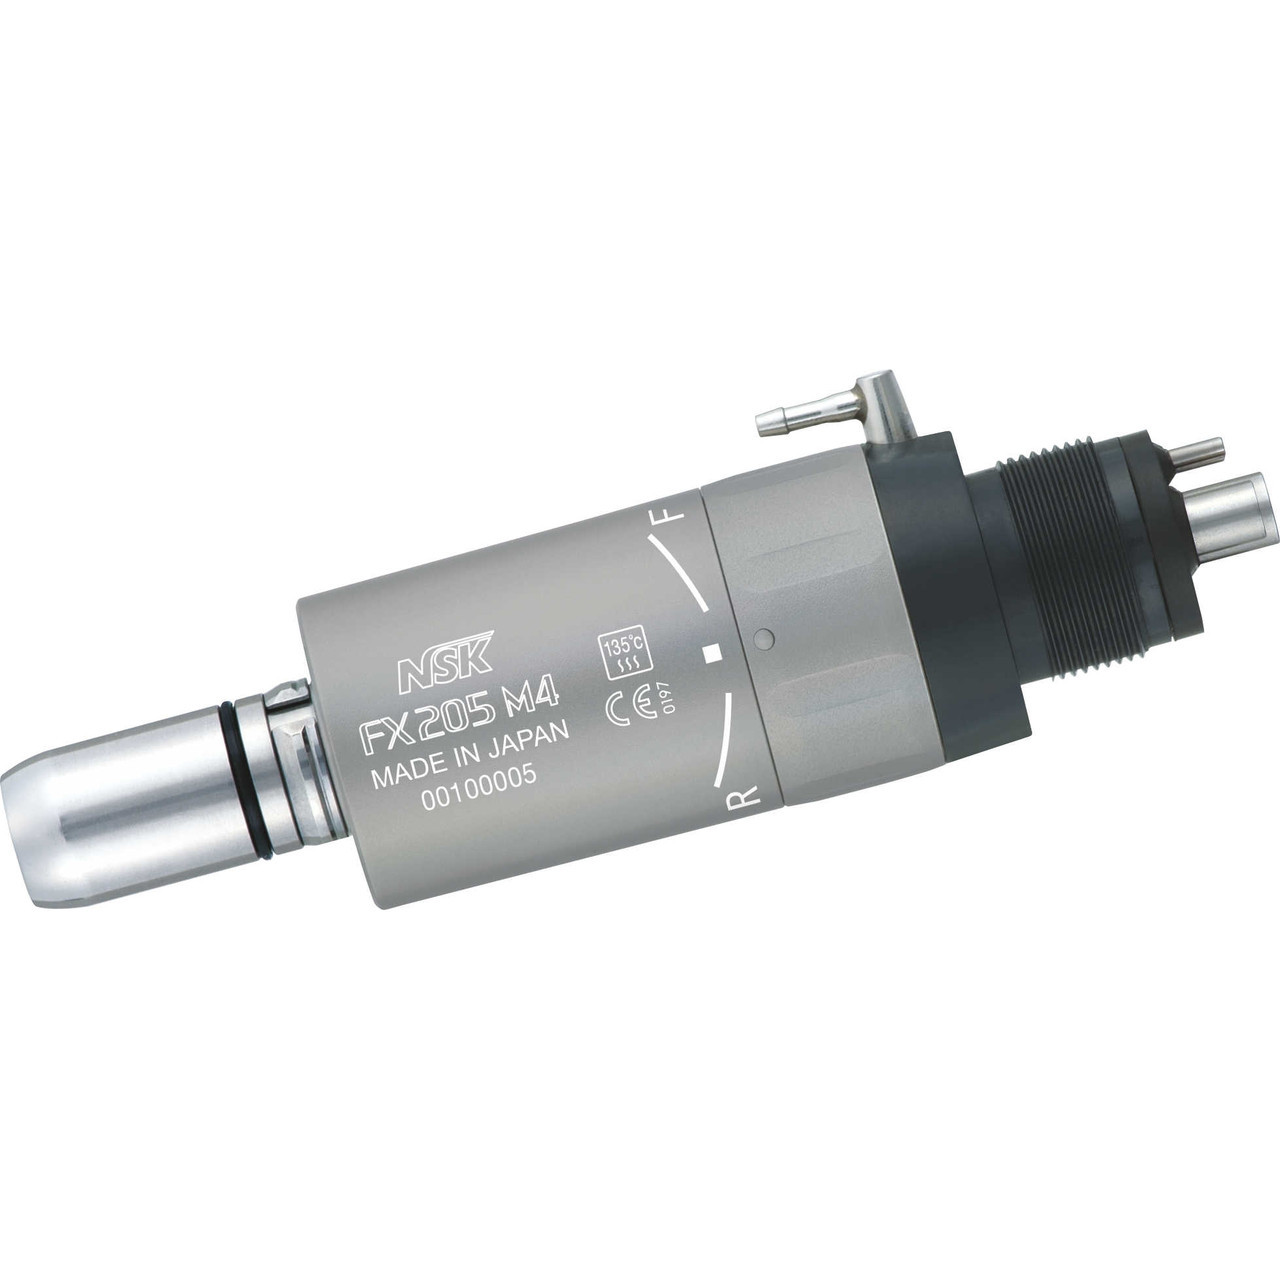 Стоматологический пневматичиcкий микромотор NSK Fx205 М4